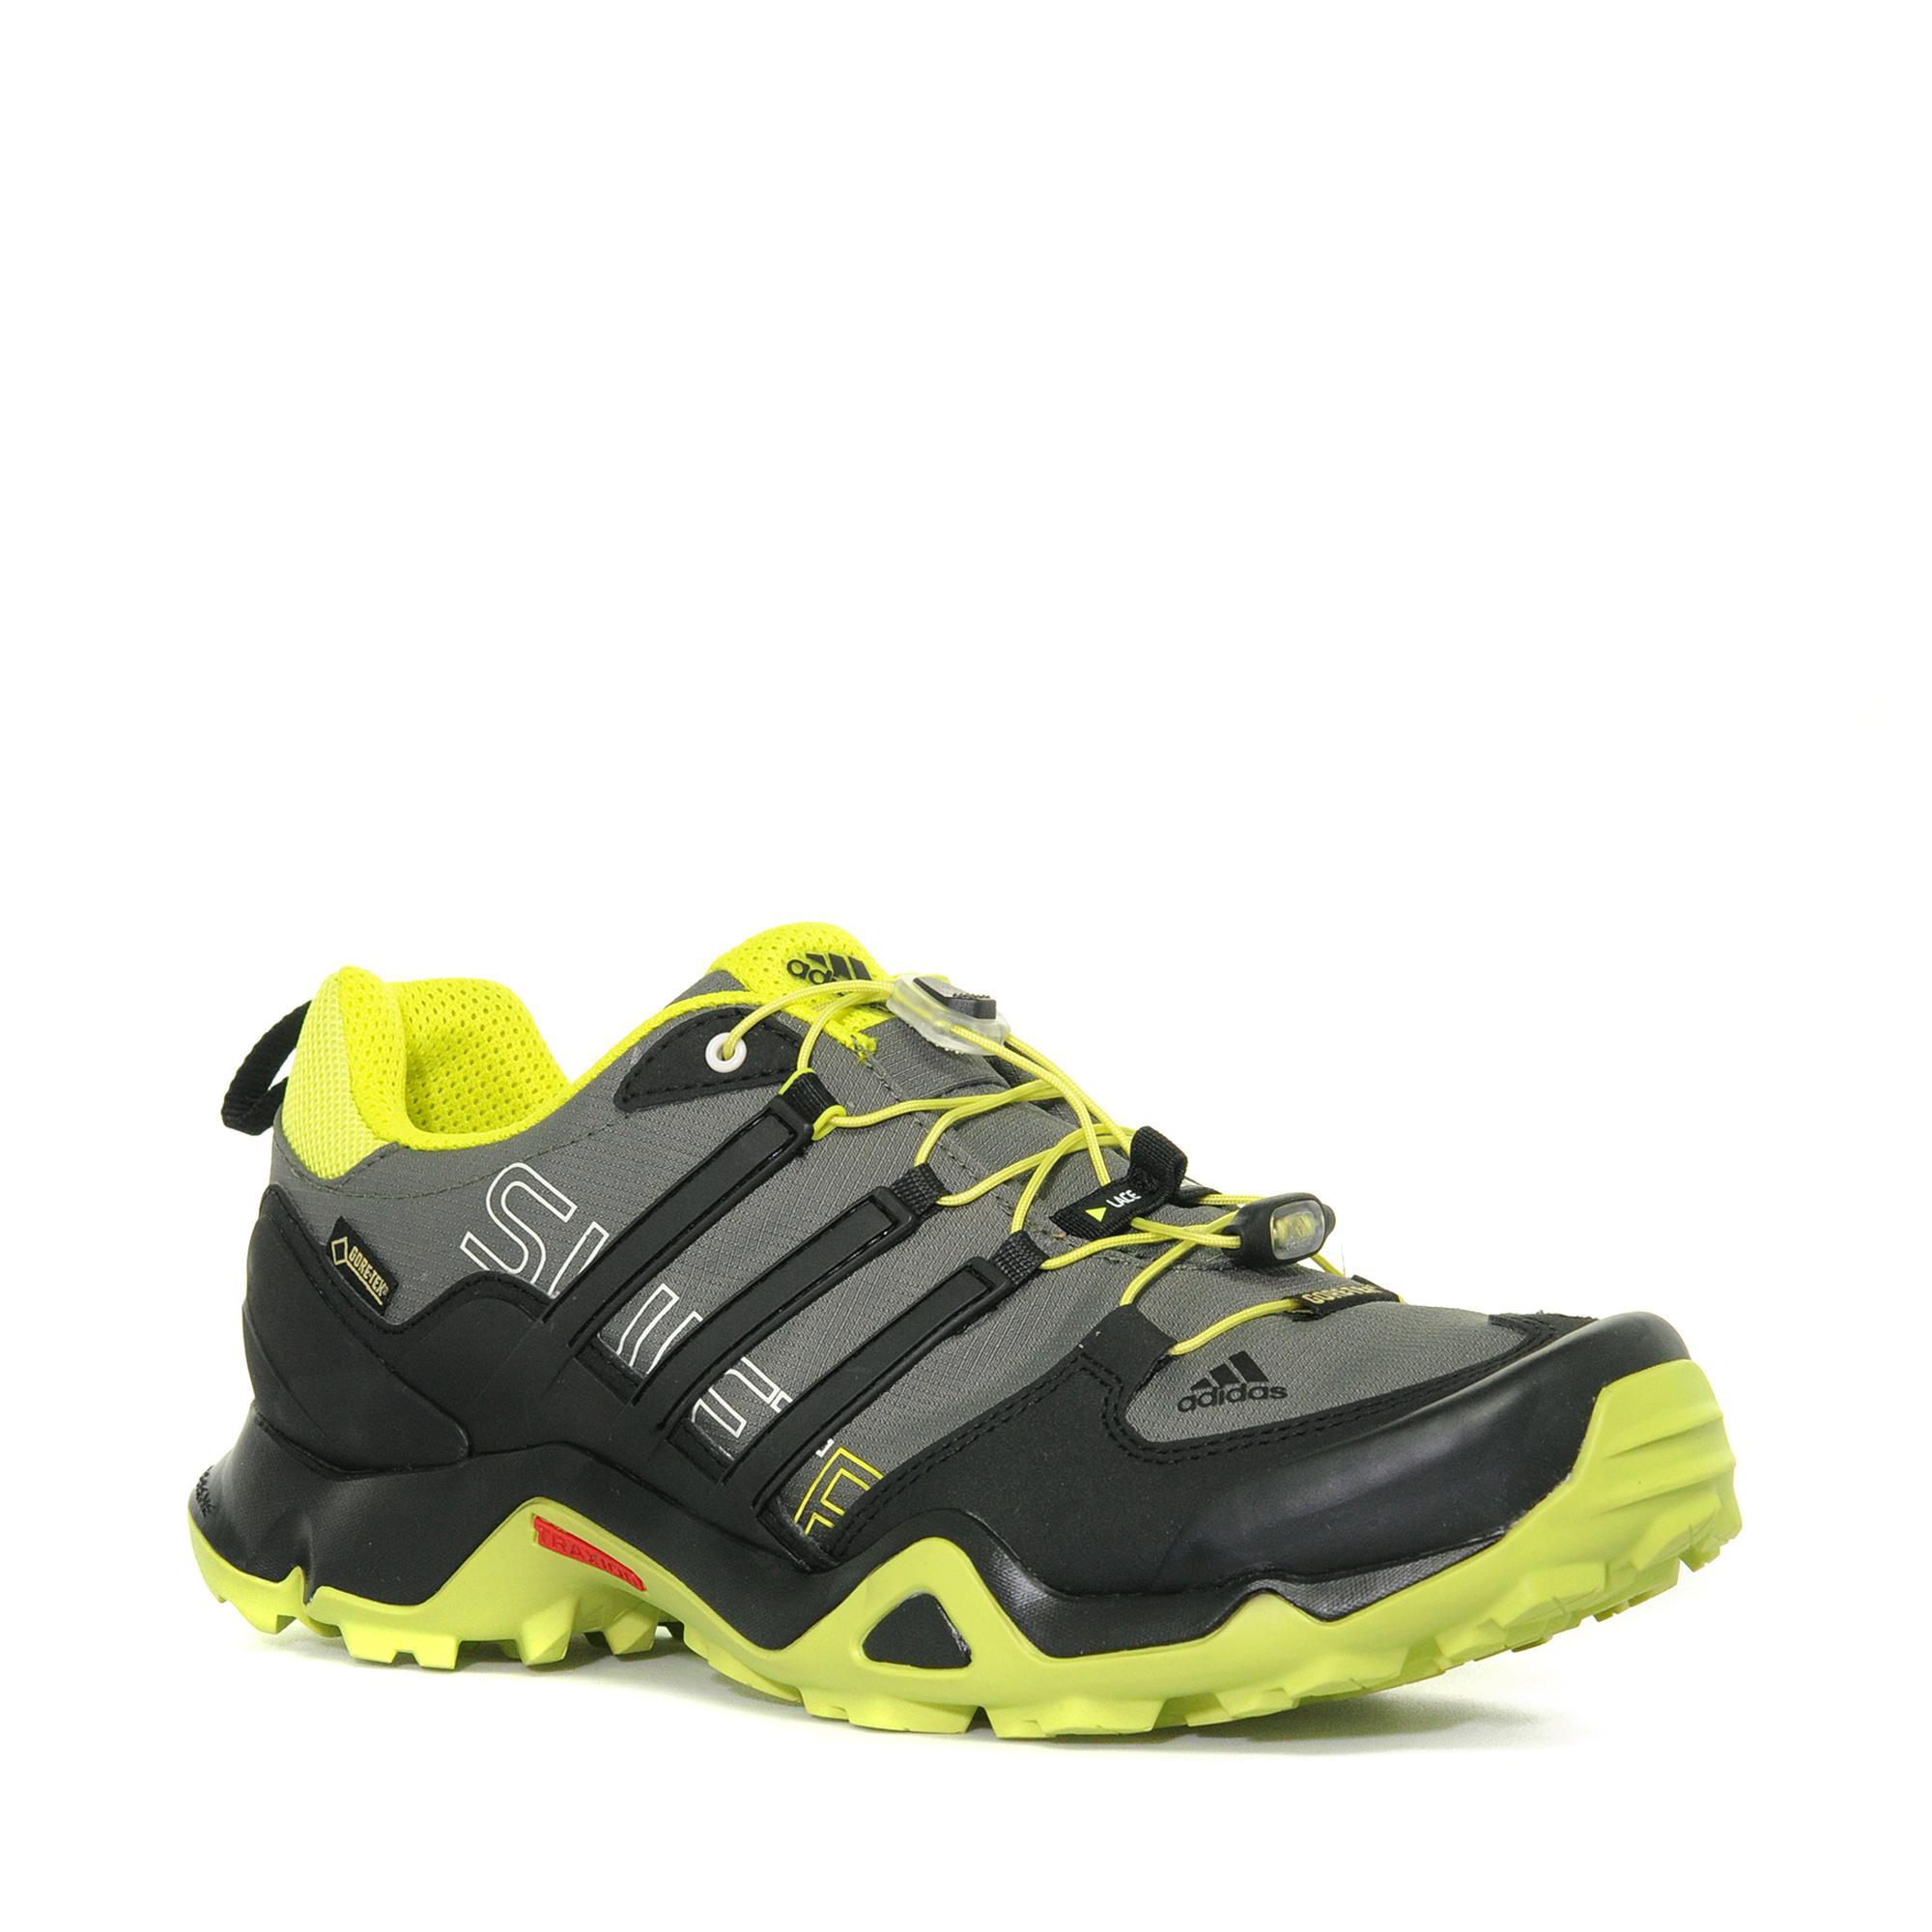 Adidas Mens Terrex Swift R GORETEX Approach Shoe Grey